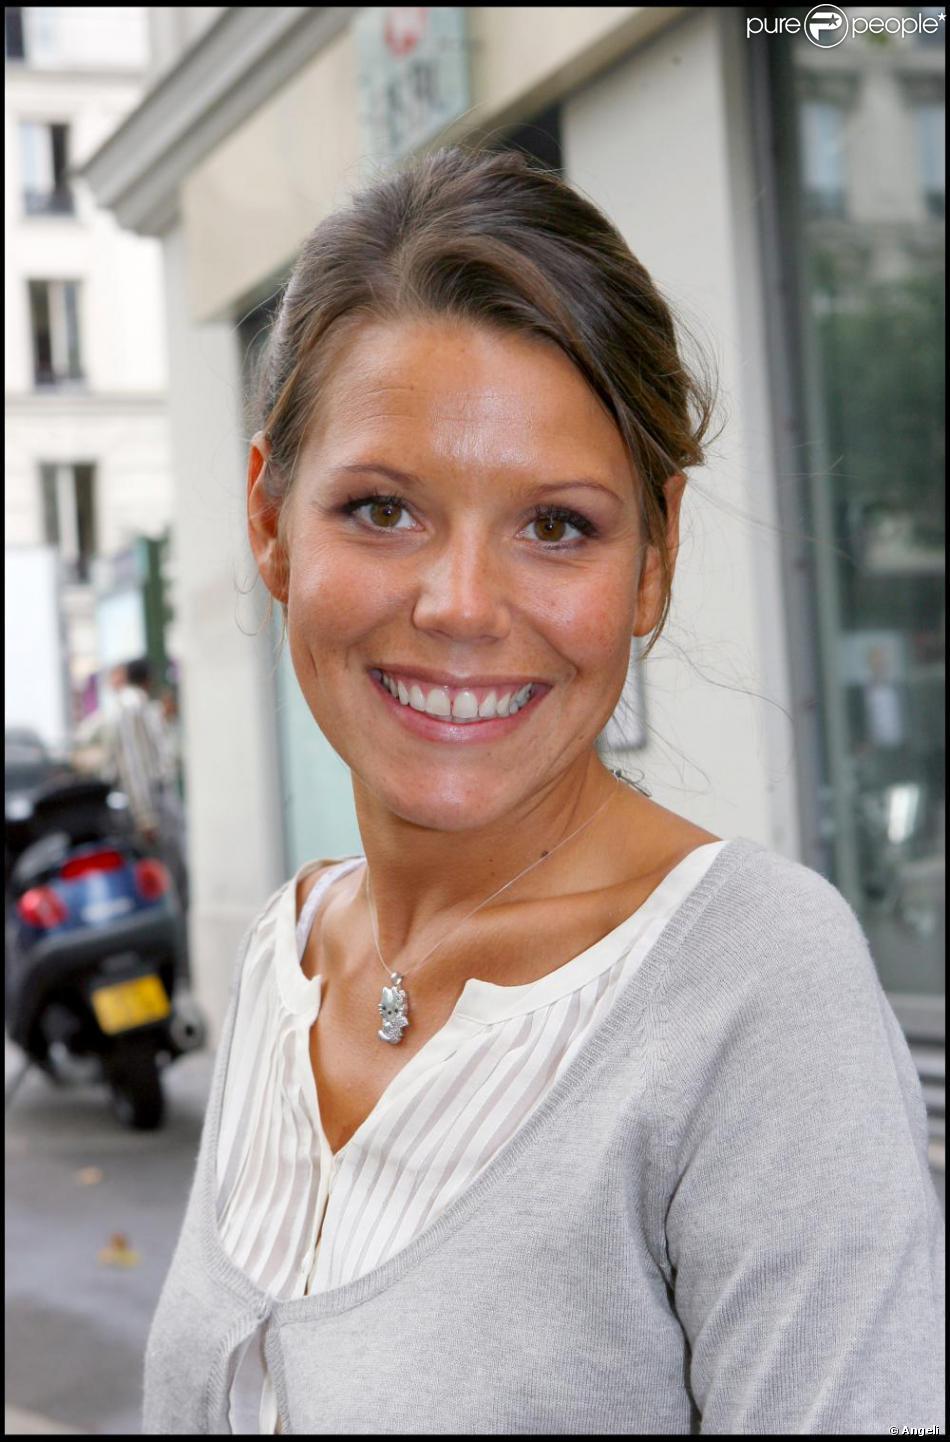 Laura tenoudji purepeople - Laura du web salaire ...